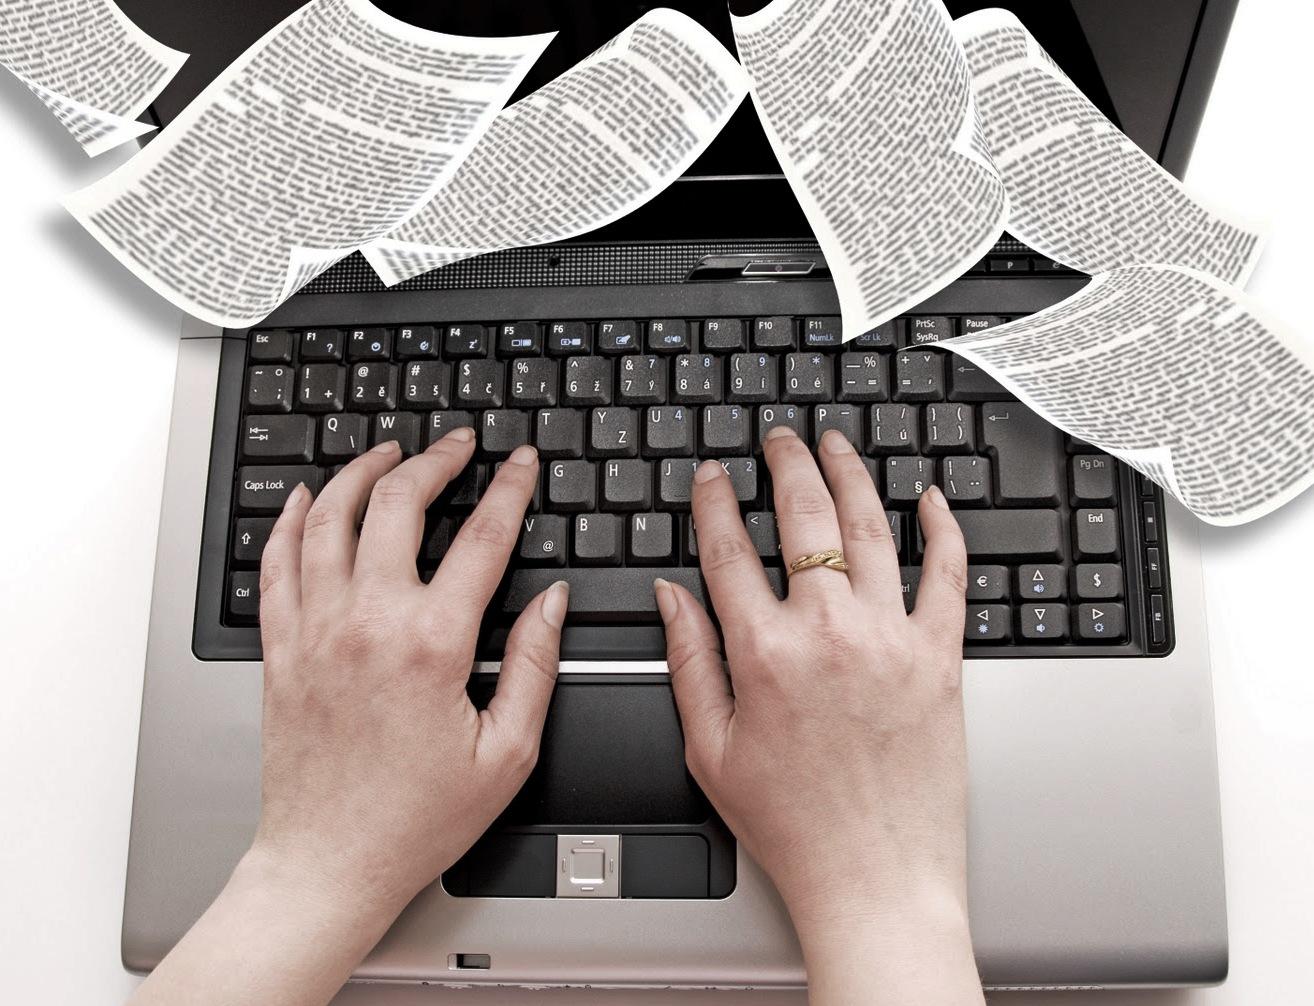 (6) Start Writing Job